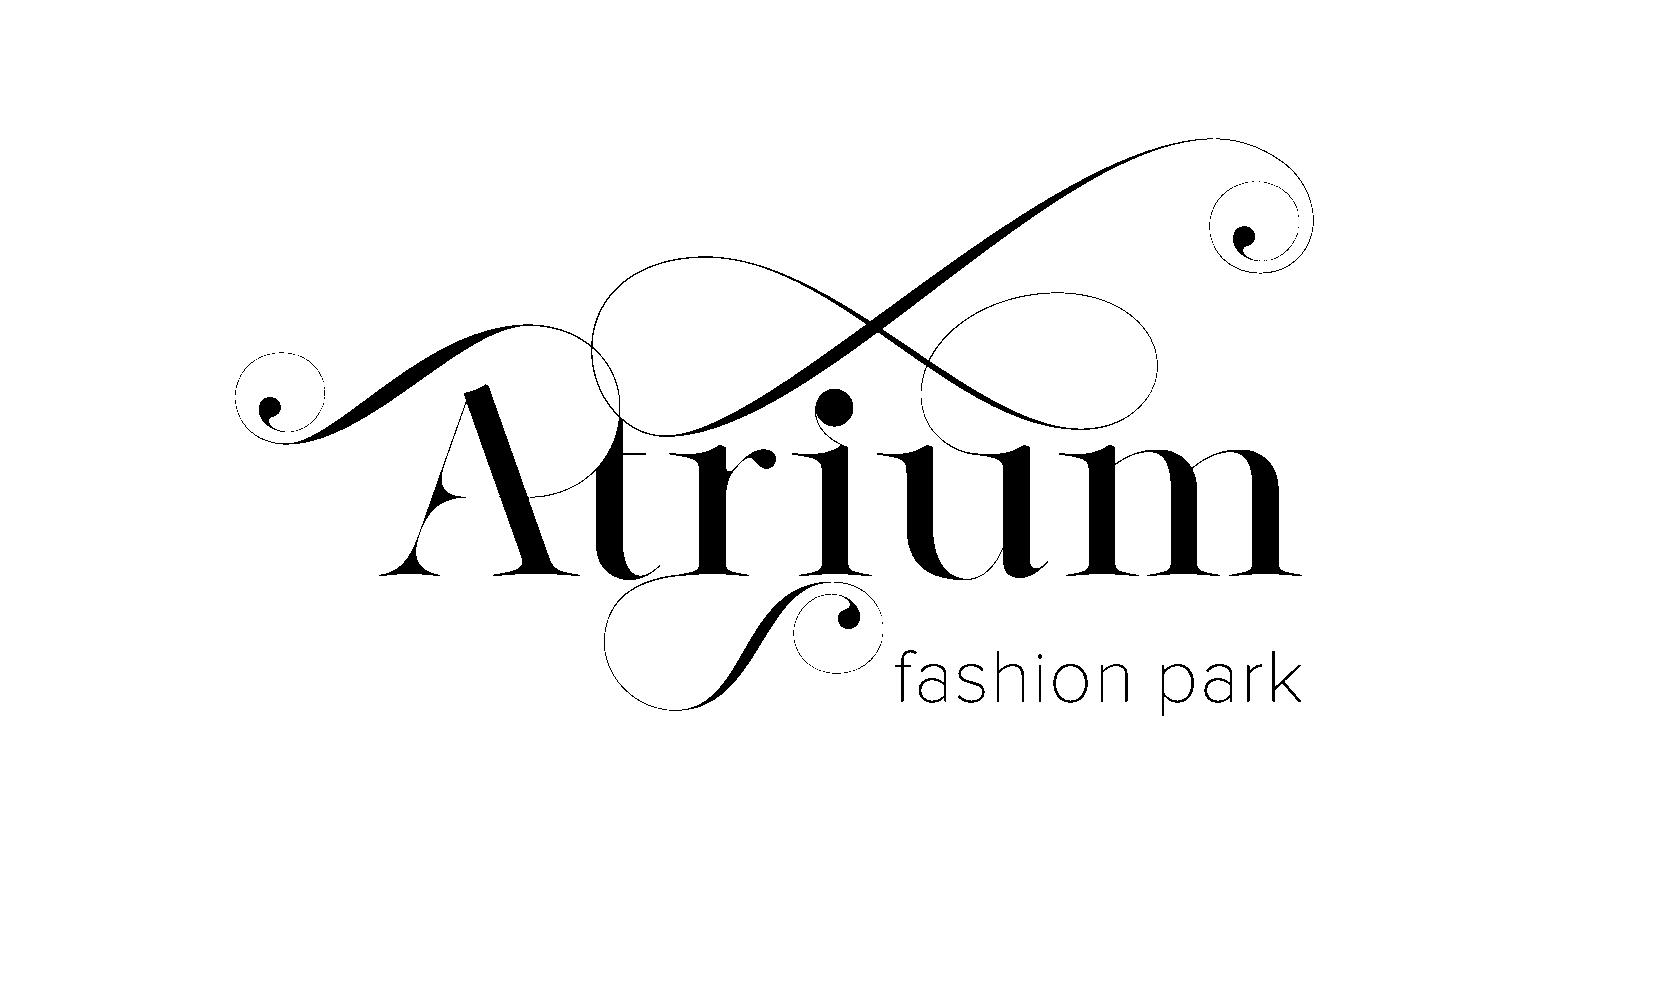 ATRIUM FASHION PARK